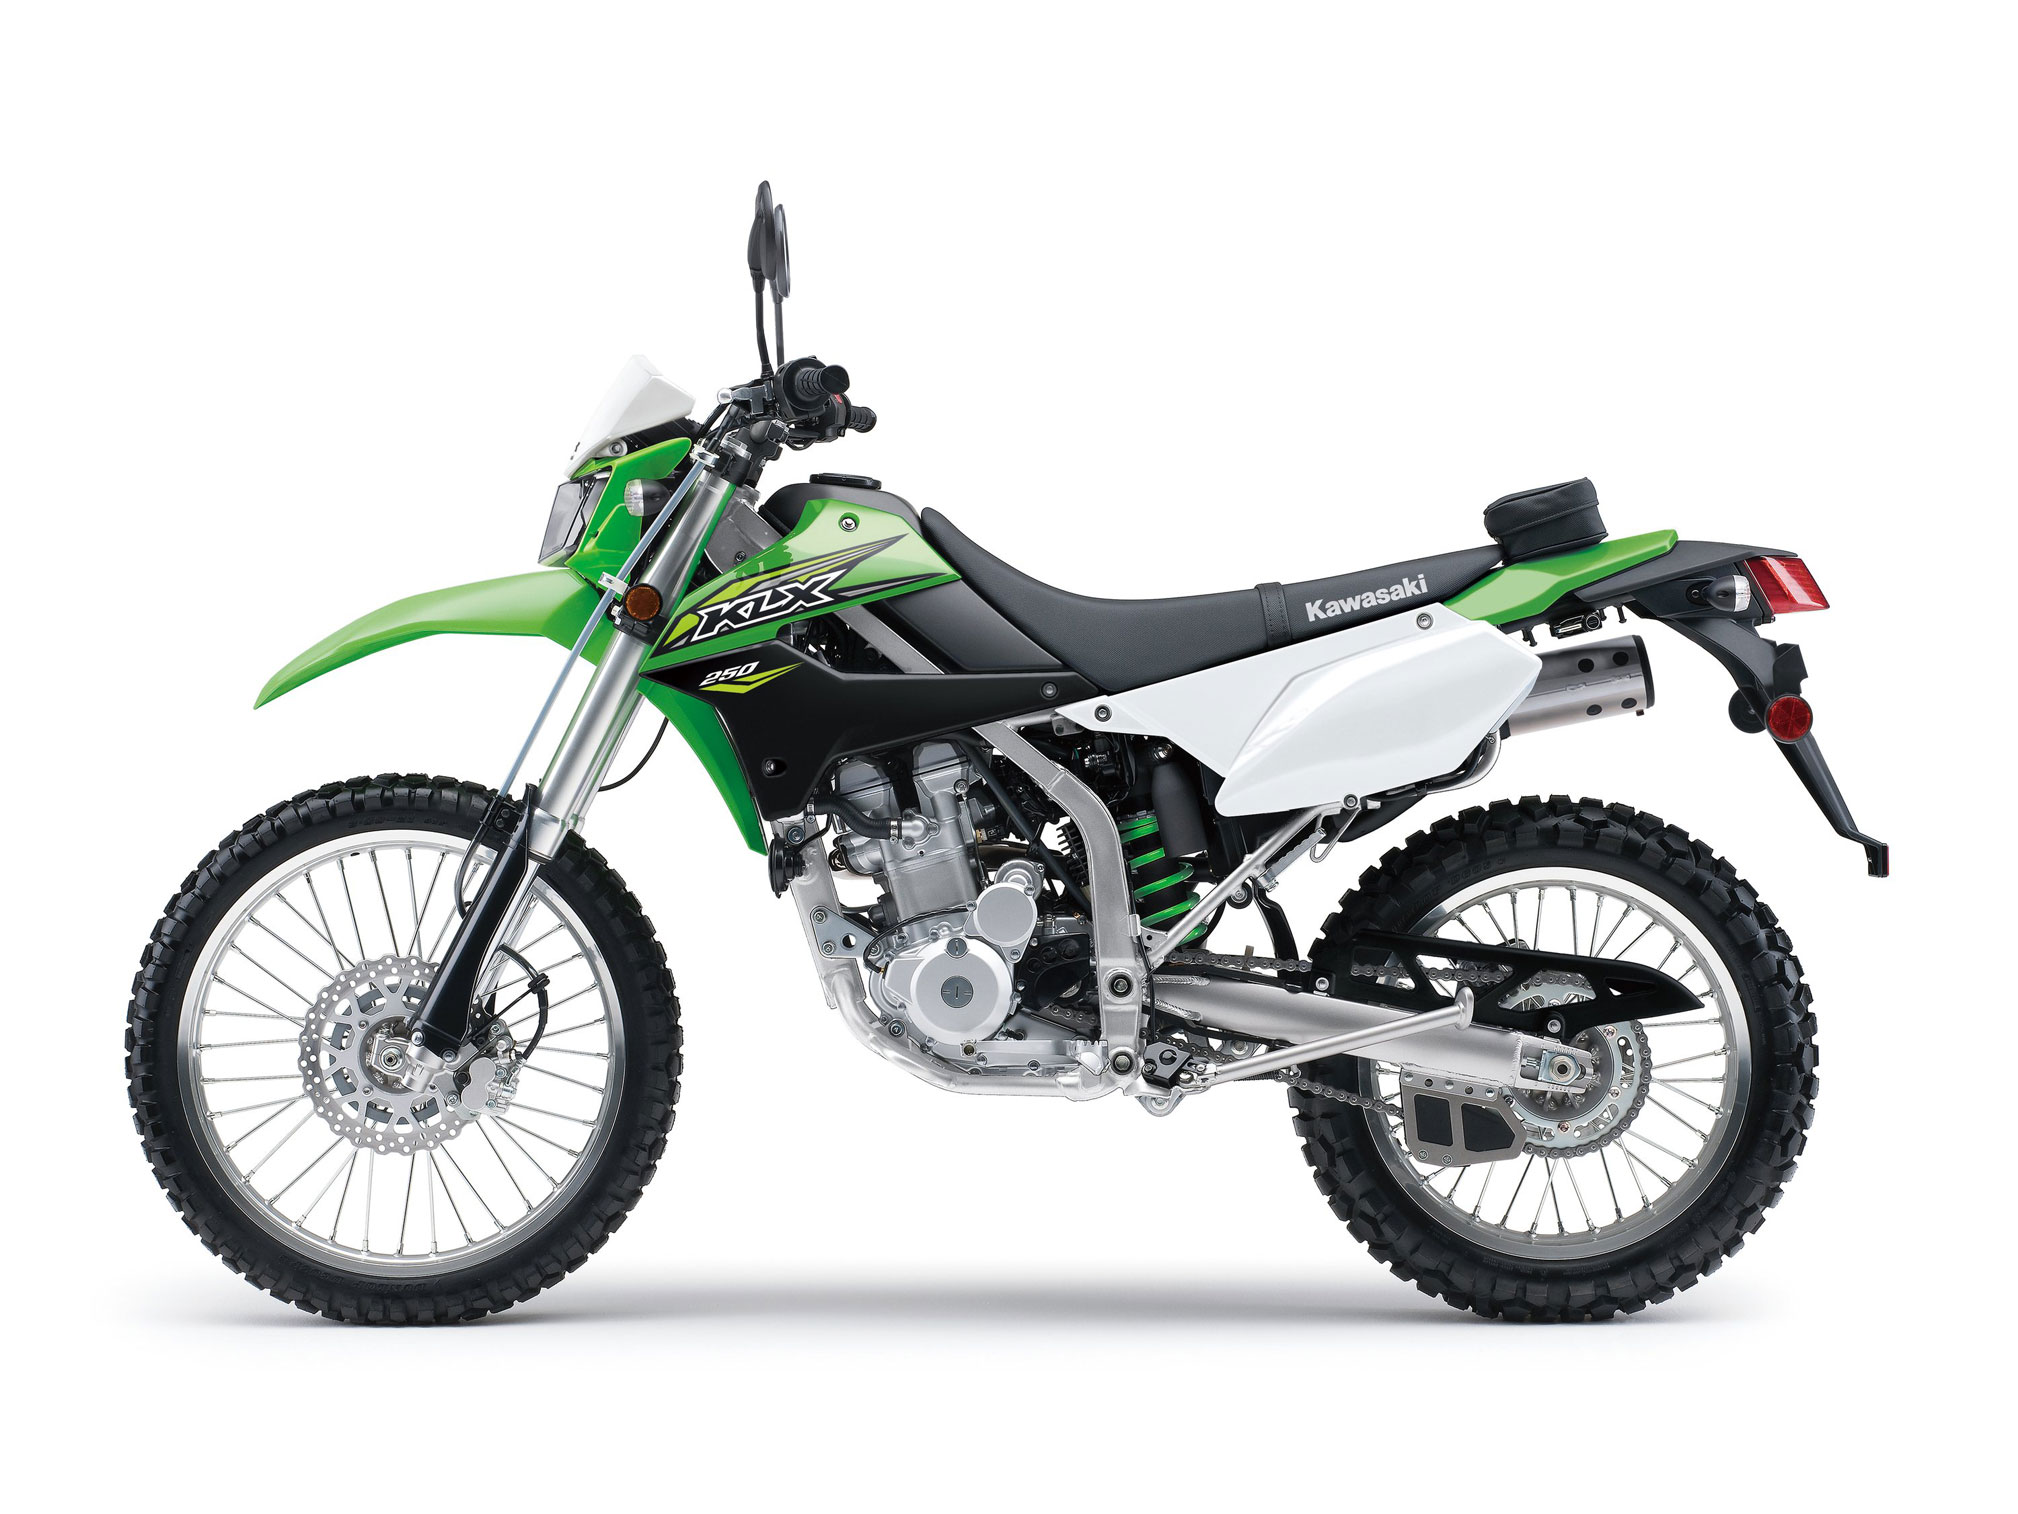 Kawasaki Klx250s Review Total Motorcycle